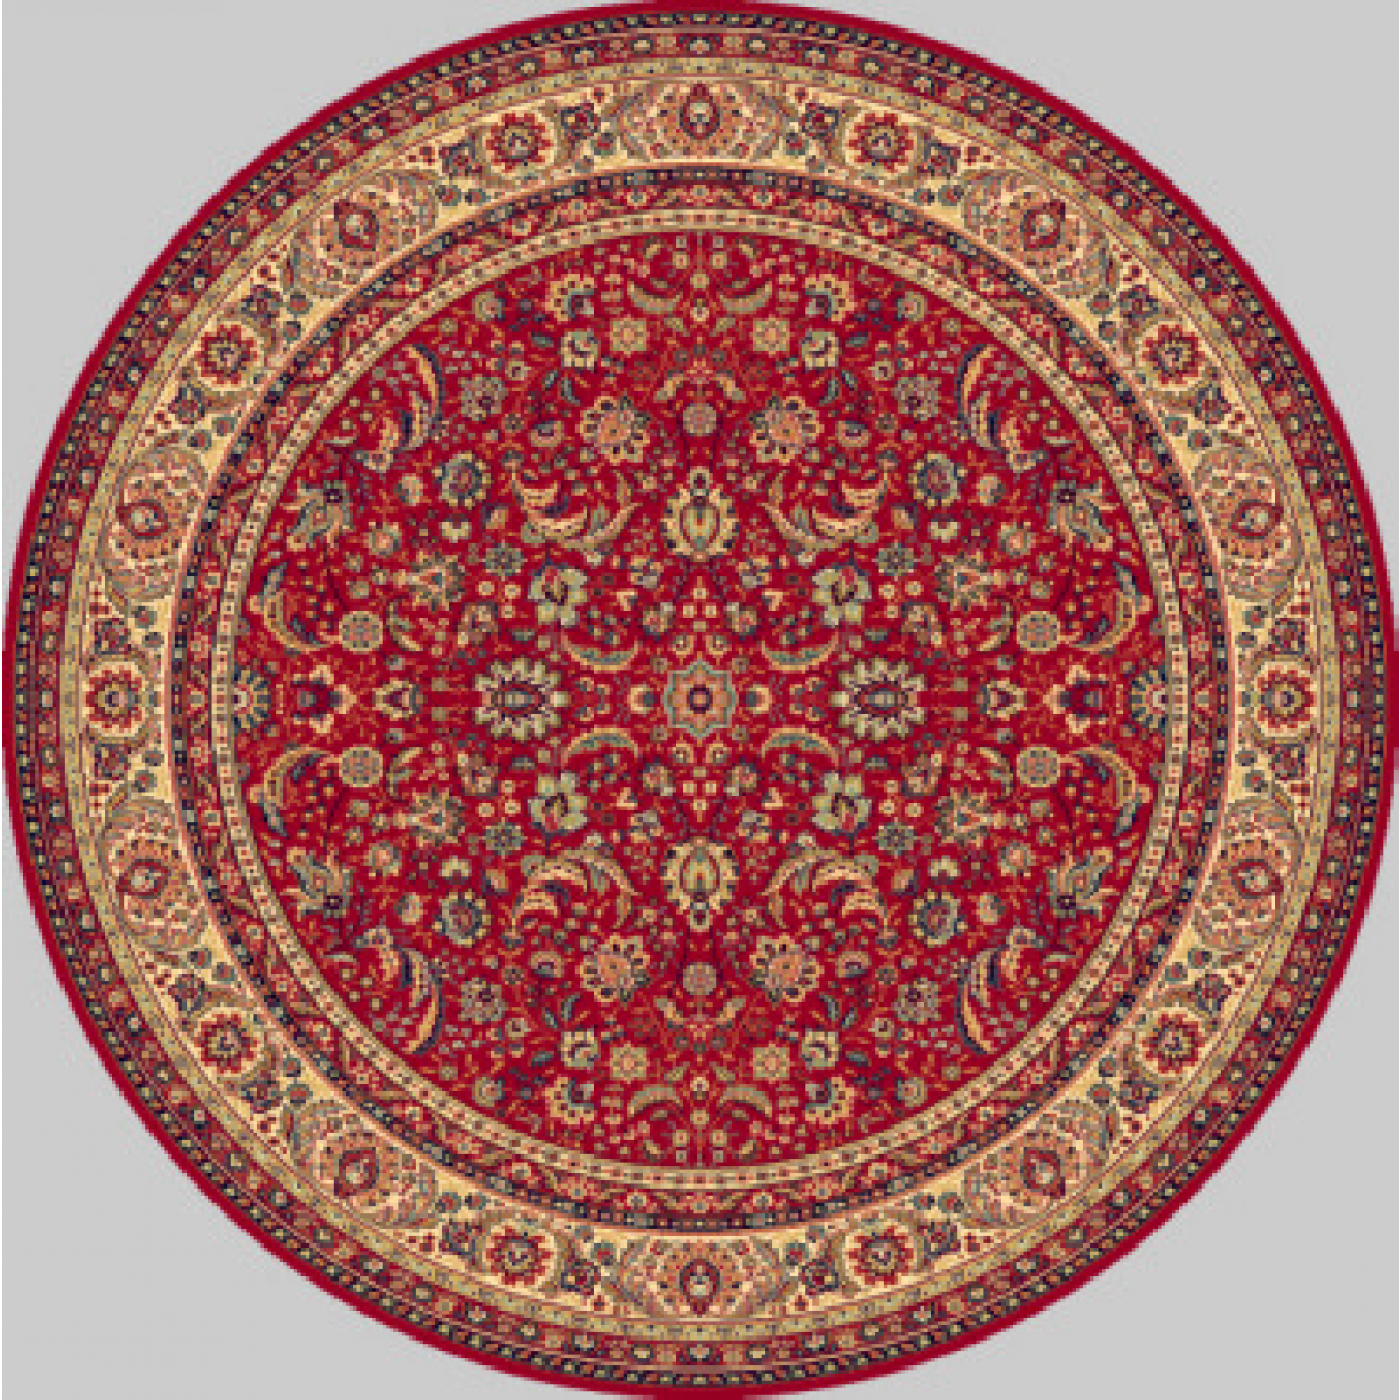 Lano Kasbah S 13720-474 rond